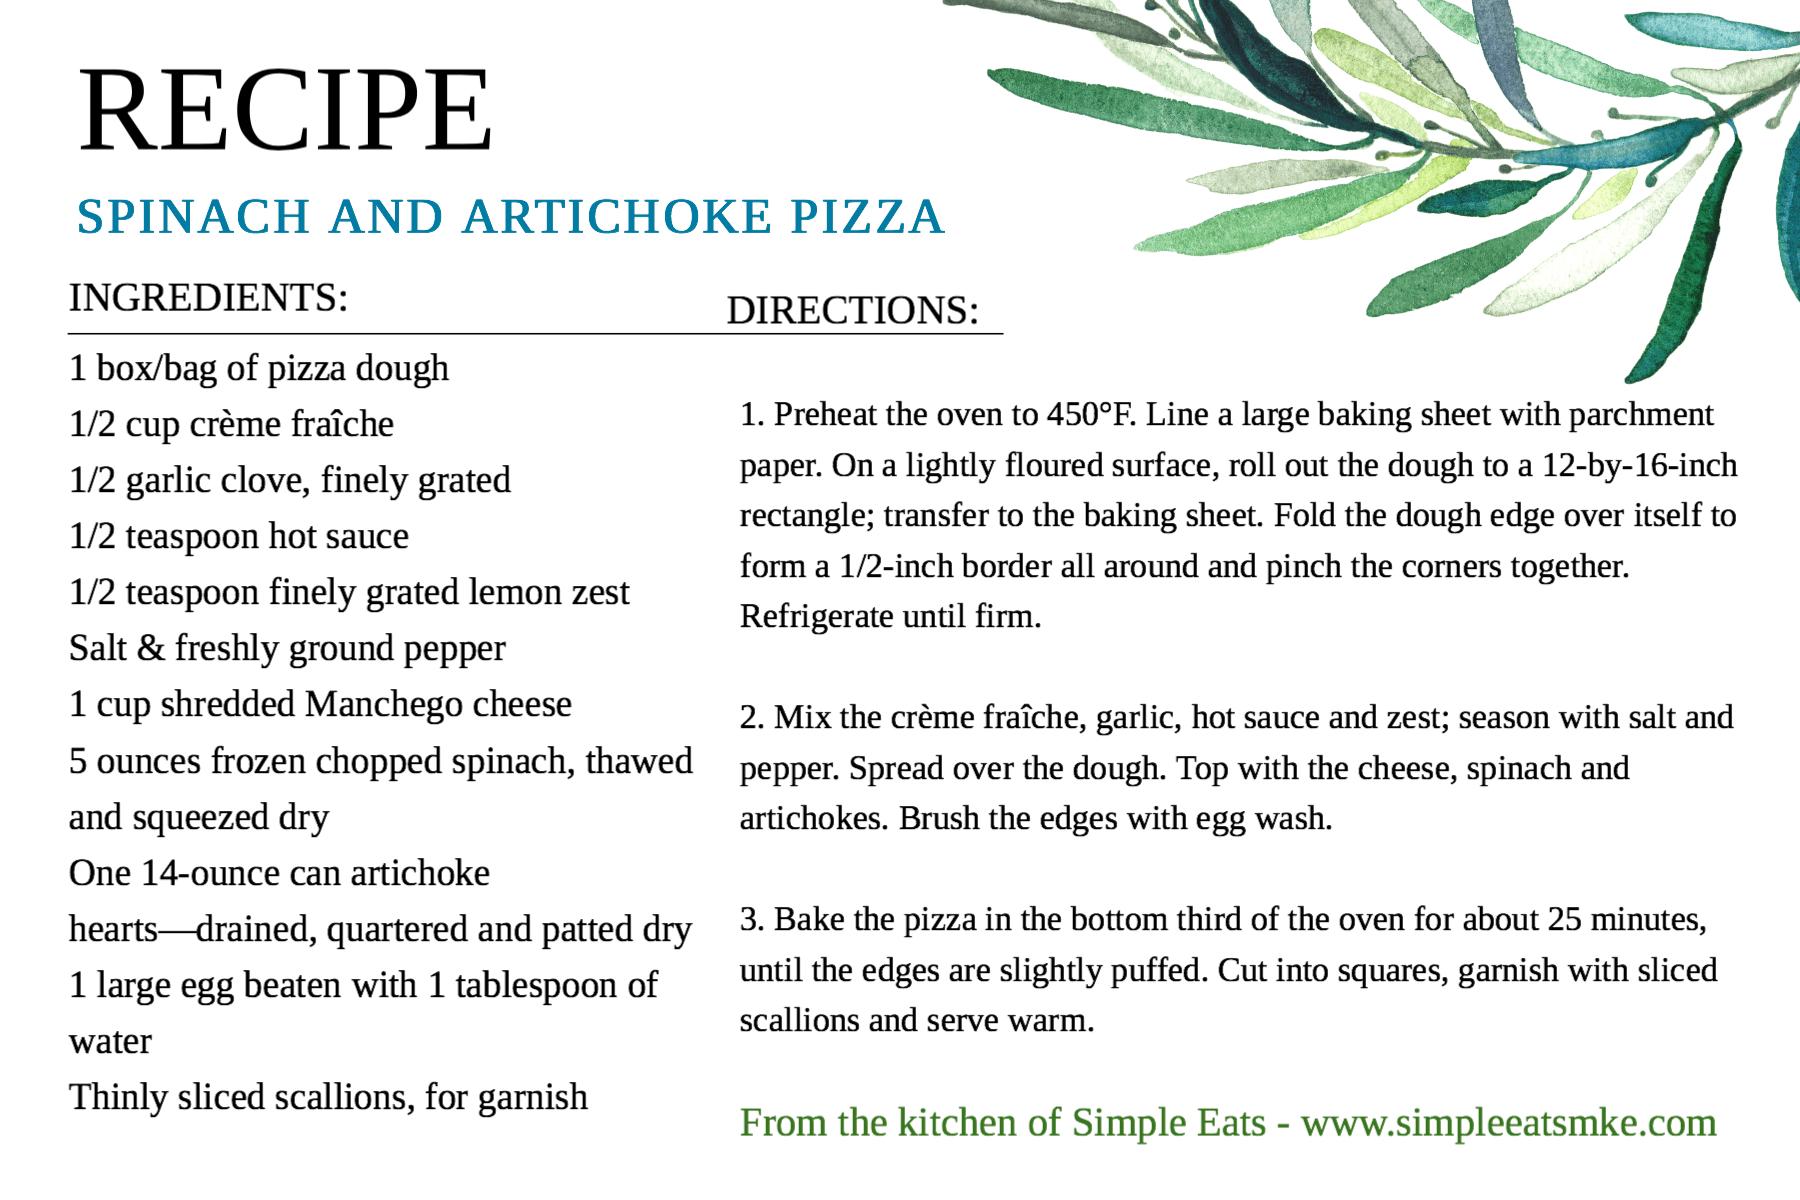 10_5 Spinach and Artichoke Pizza.jpg